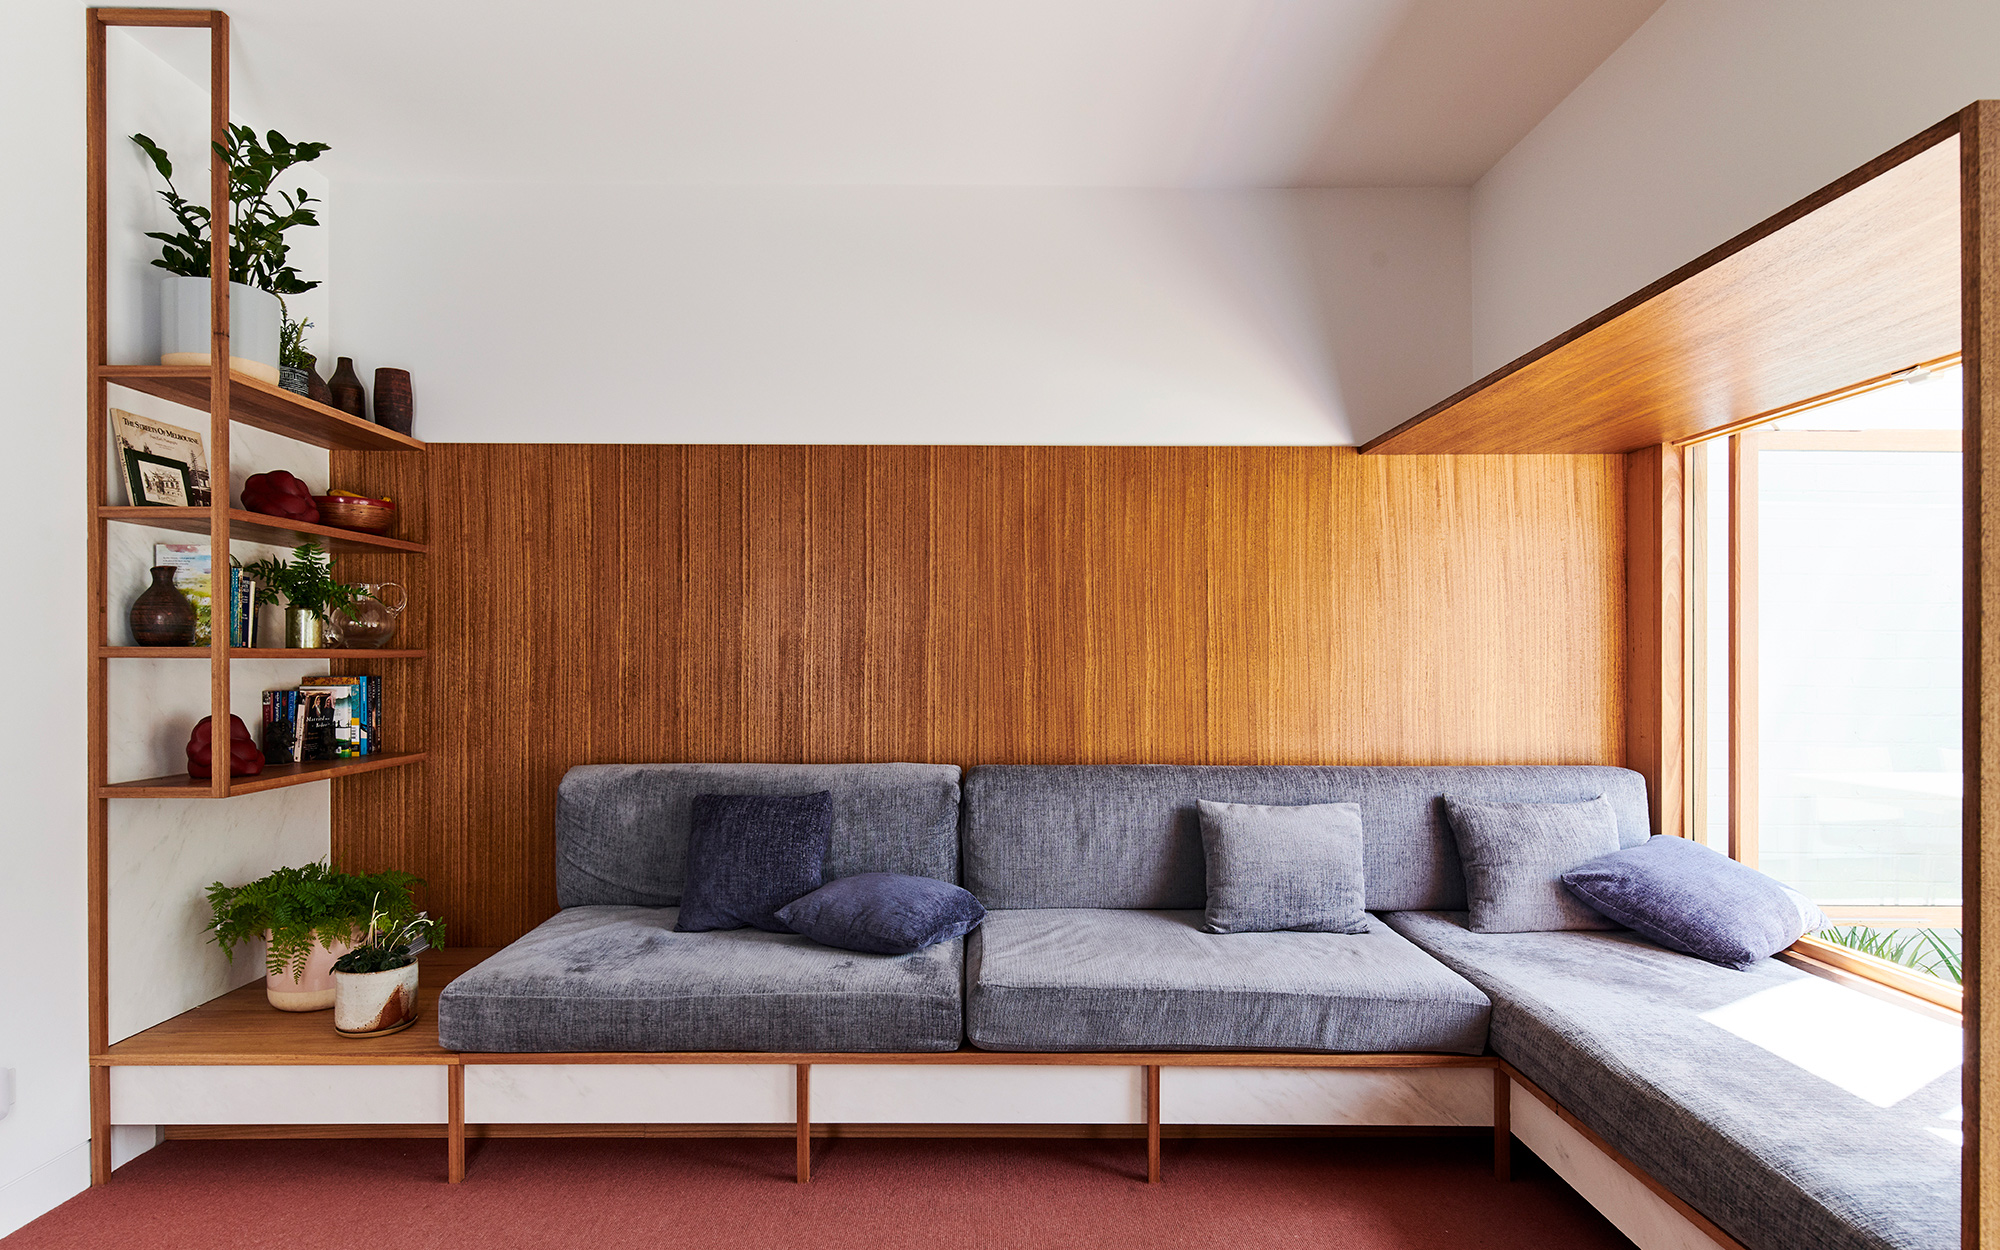 Melrose Terrasse - projeto Dan Gayfer Design - Dean Bradley/Divulgação